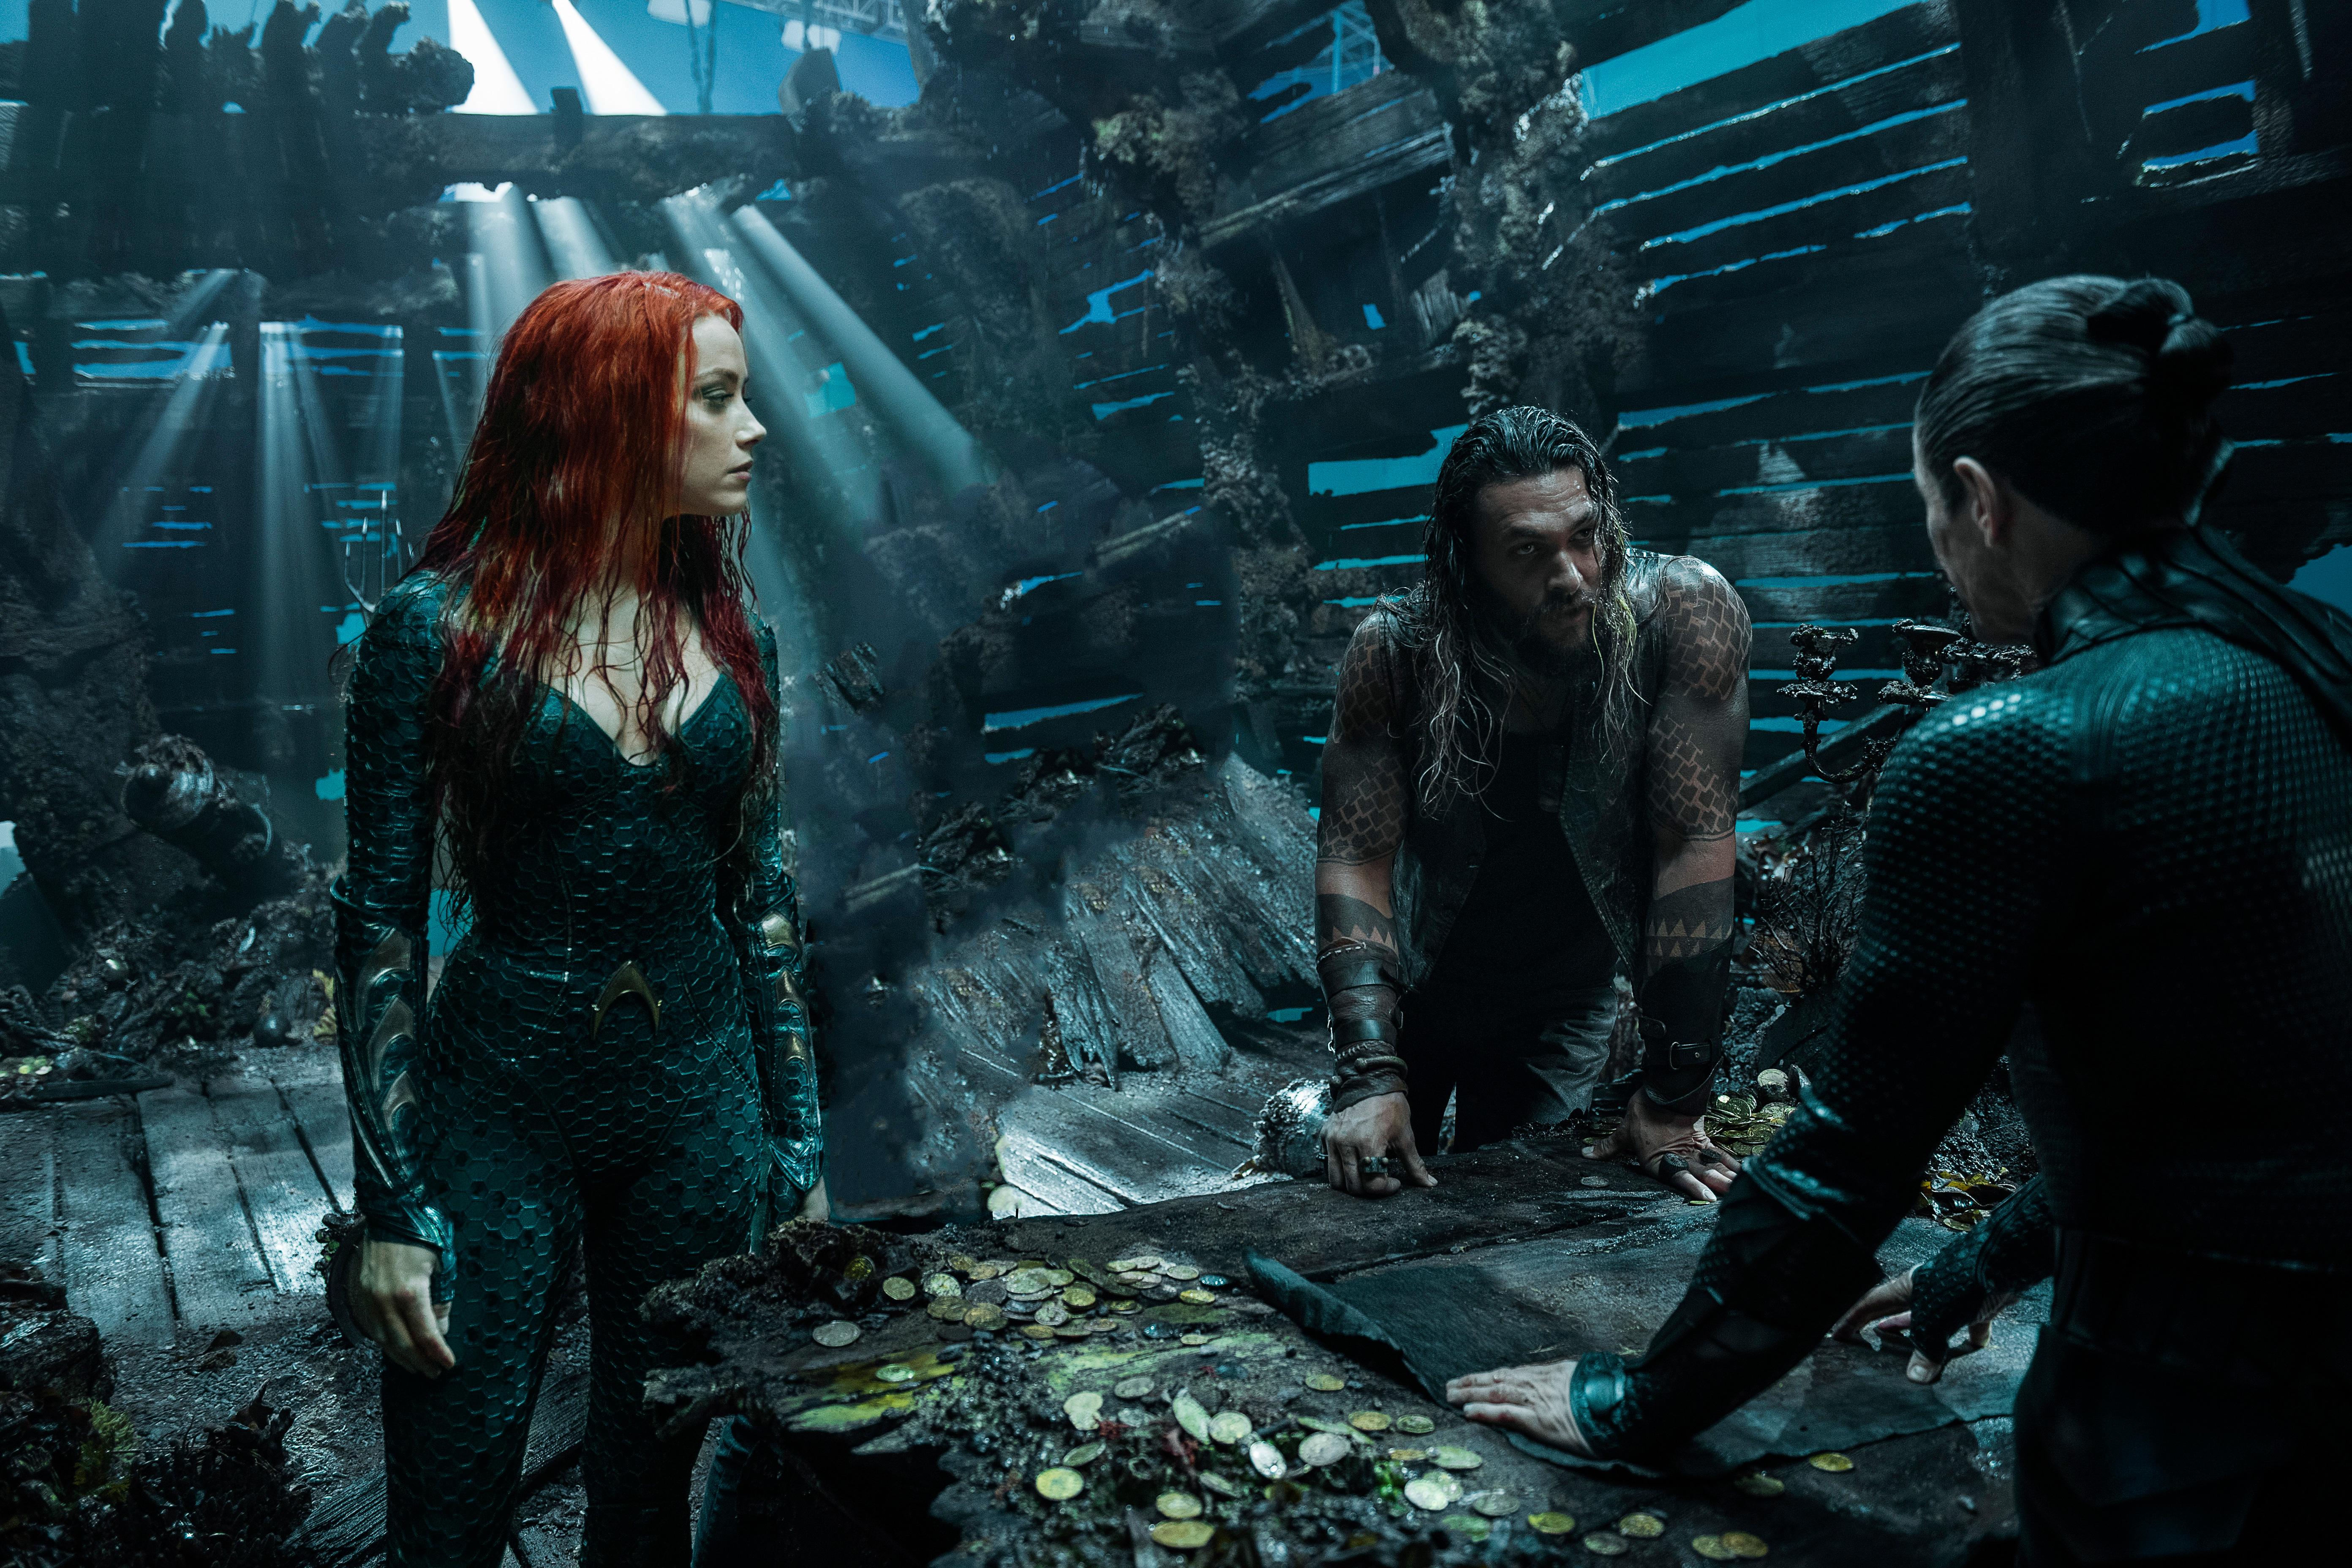 Aquaman 2018 Movie 4k Wallpapers: Arthur Curry And Amber Heard As Mera In Aquaman 2018, HD